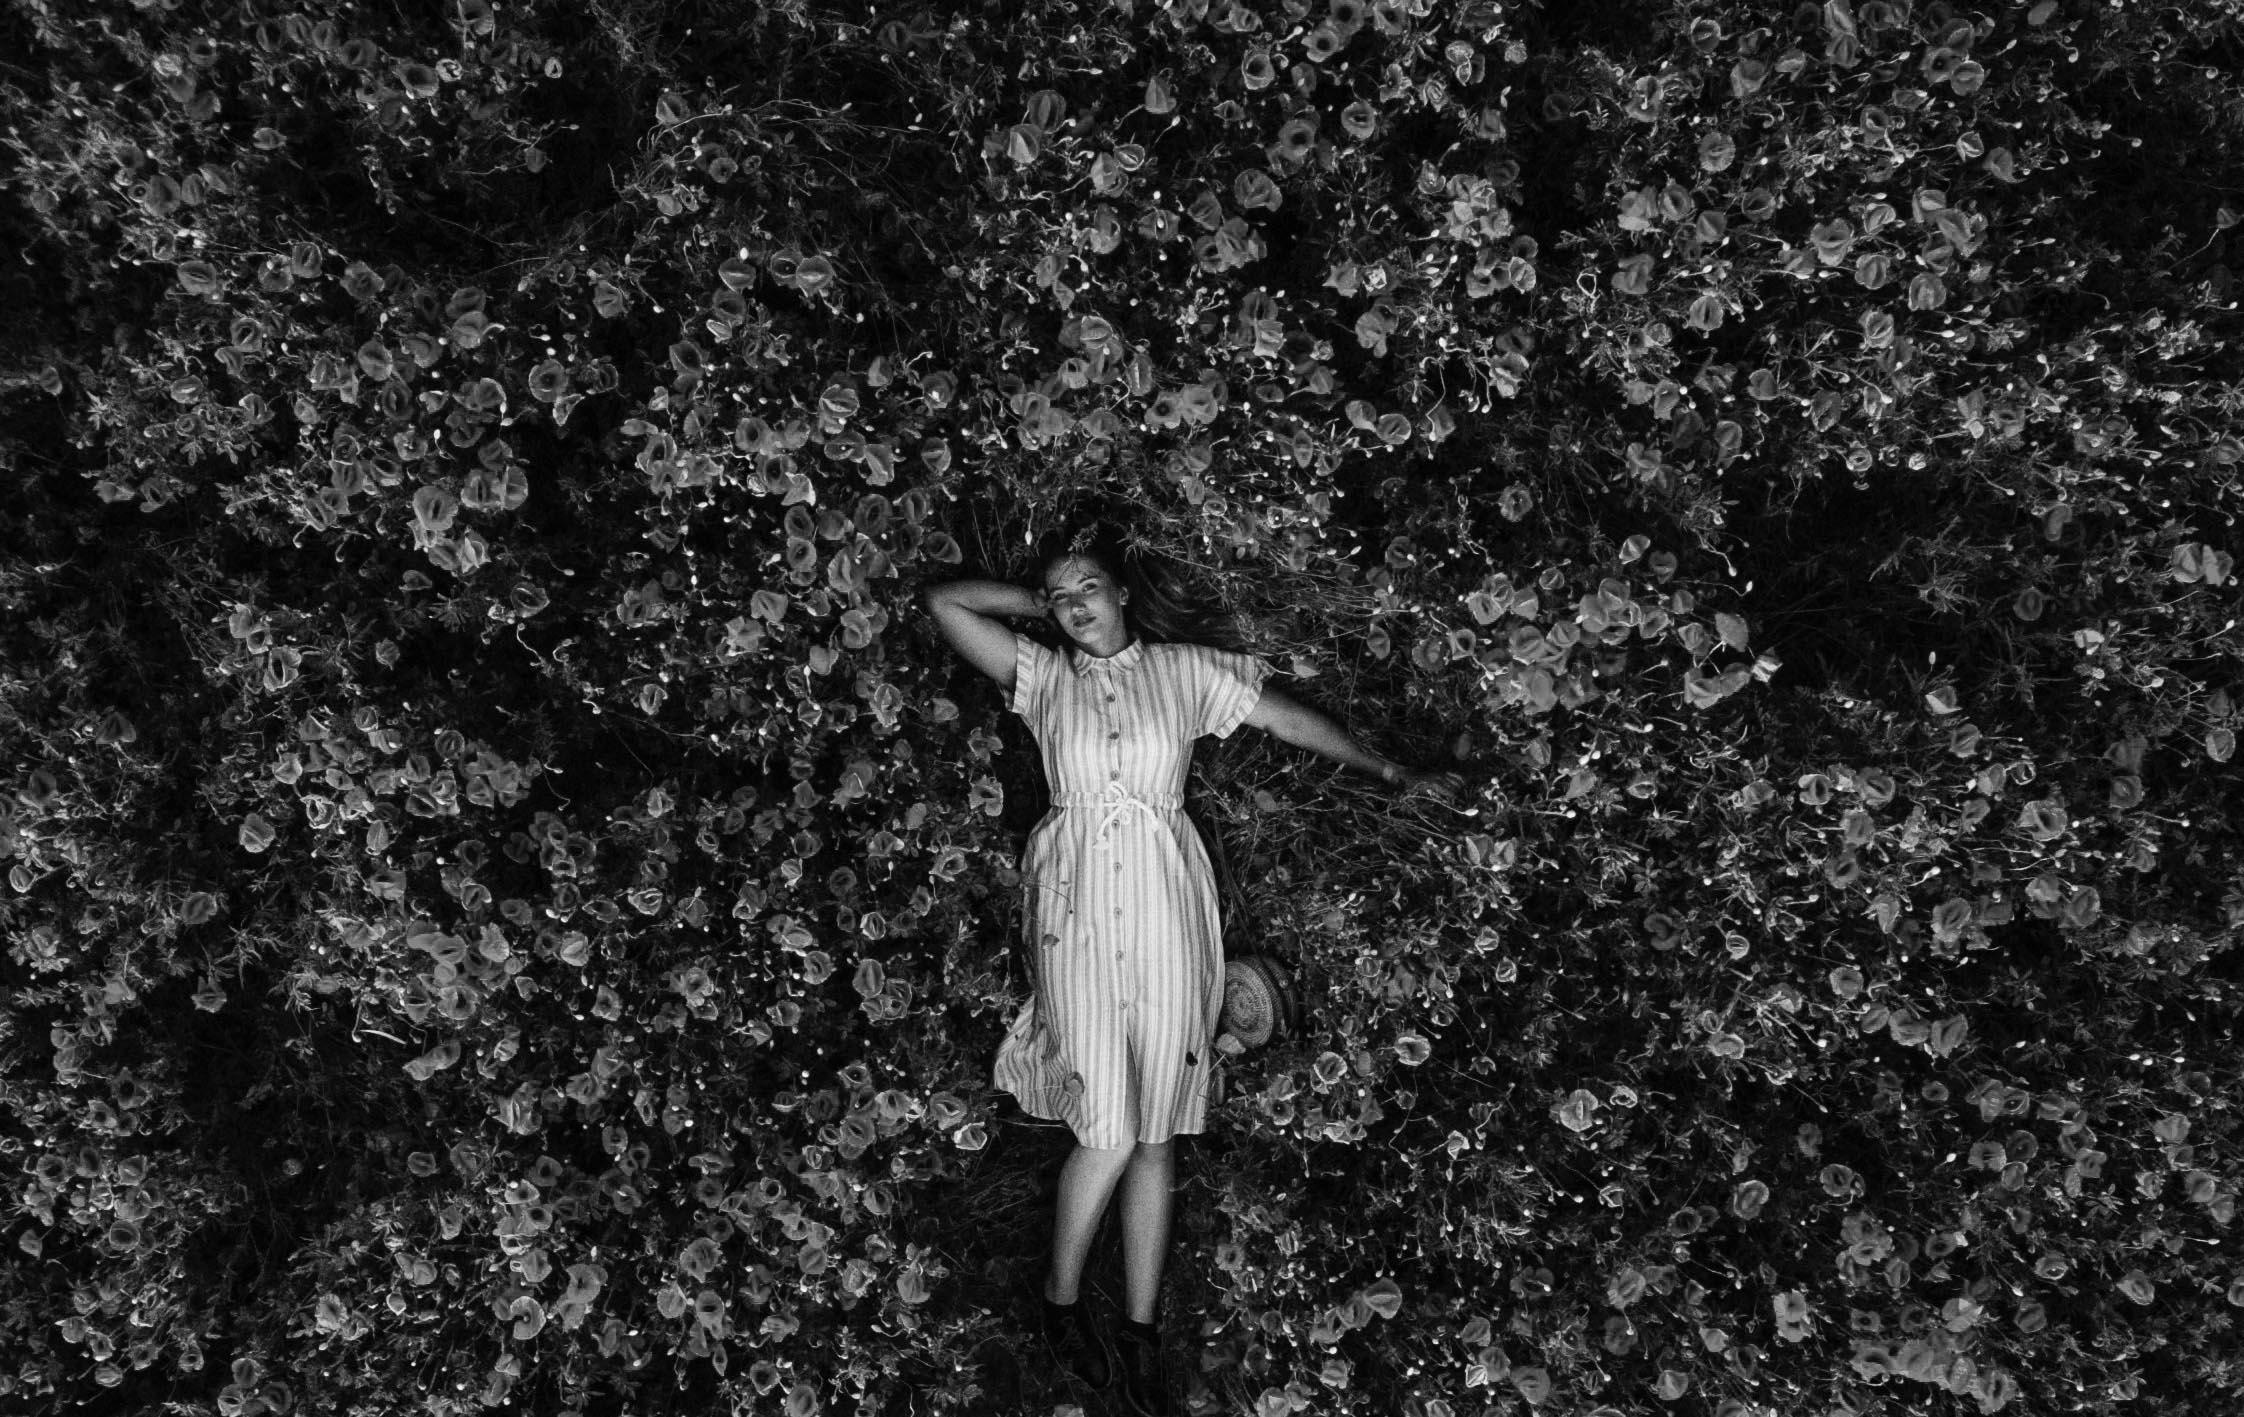 Girl Fine art photography